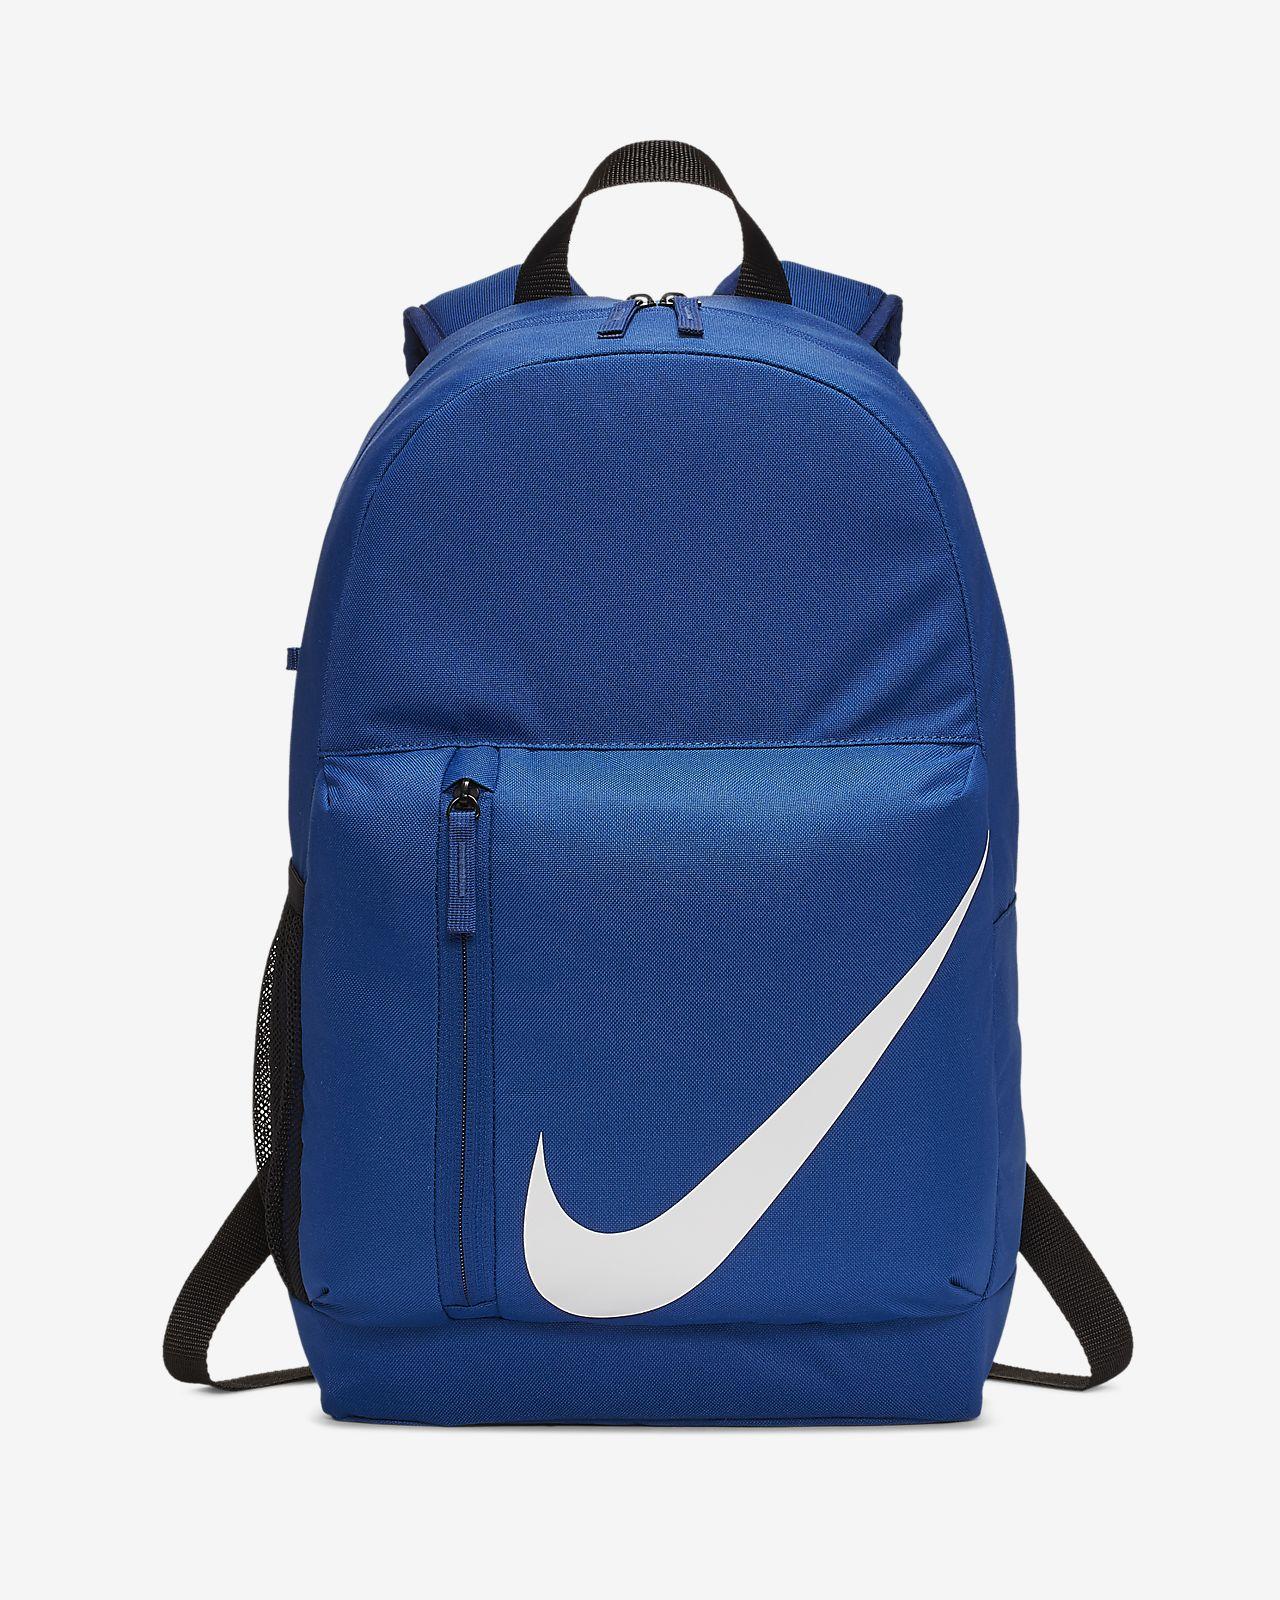 994e73b39 Nike Mochila - Niño/a. Nike.com ES